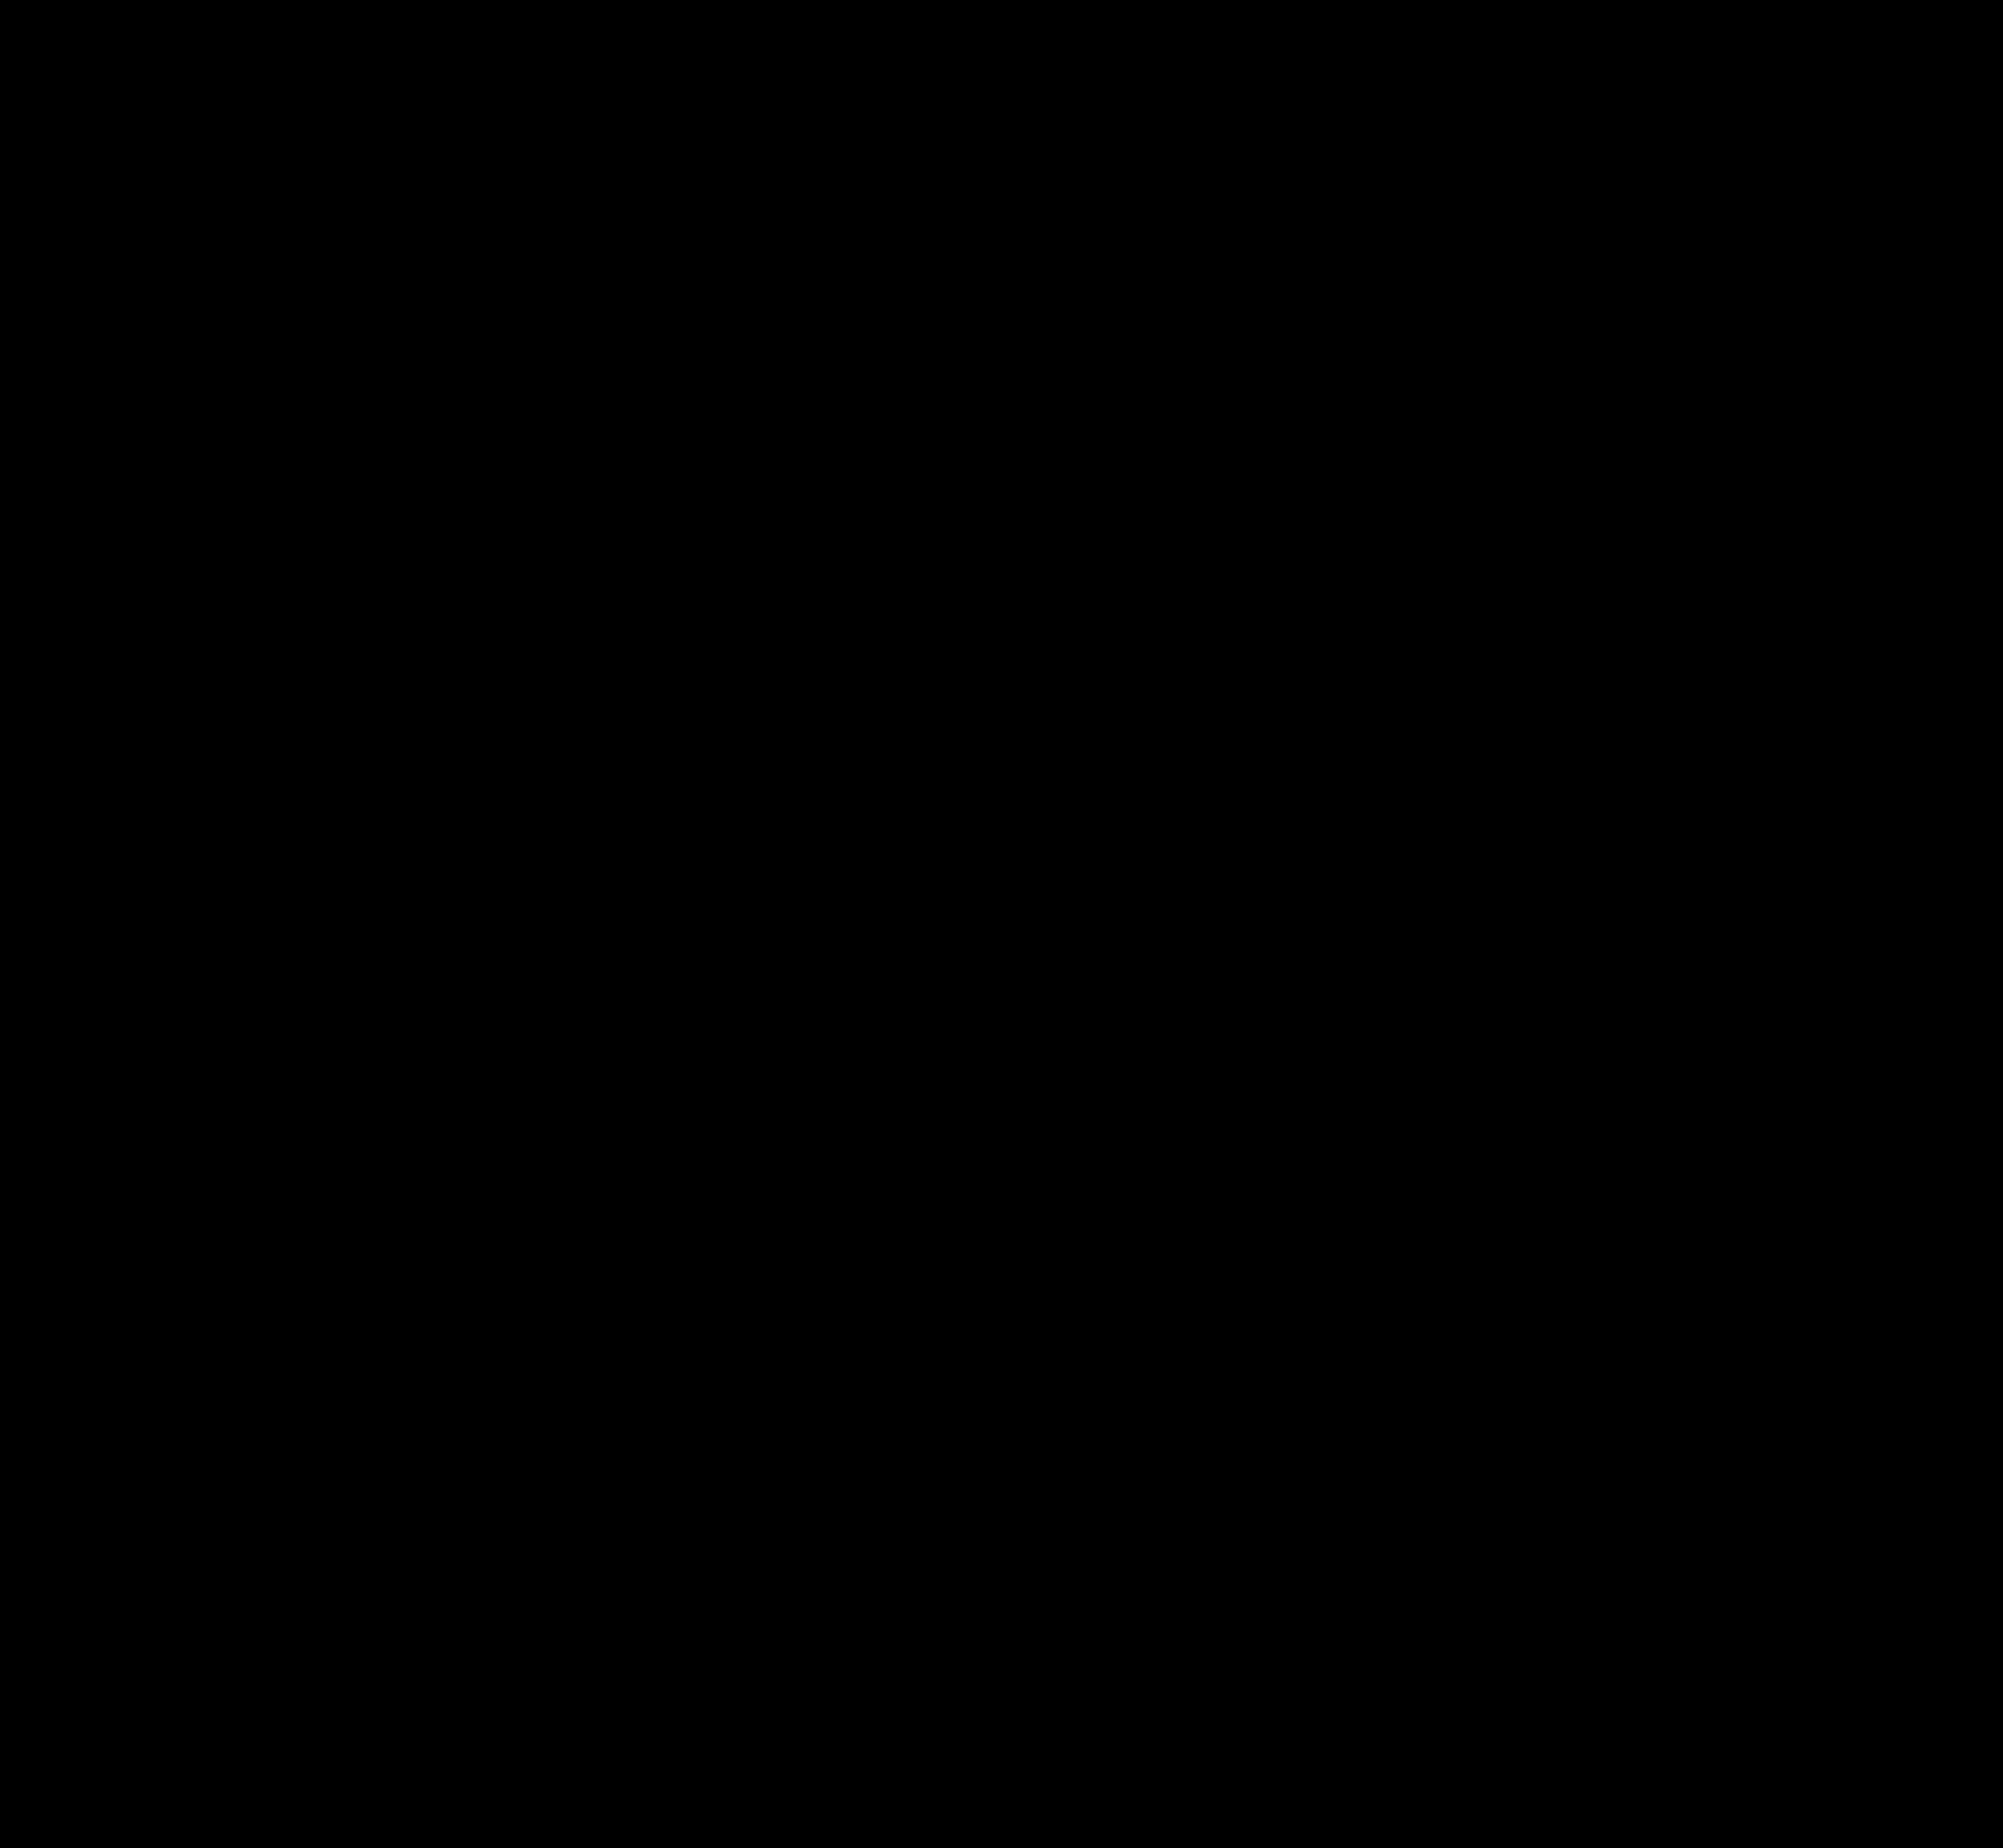 Frankenstein clipart silhouette. Monster profile dingbat big